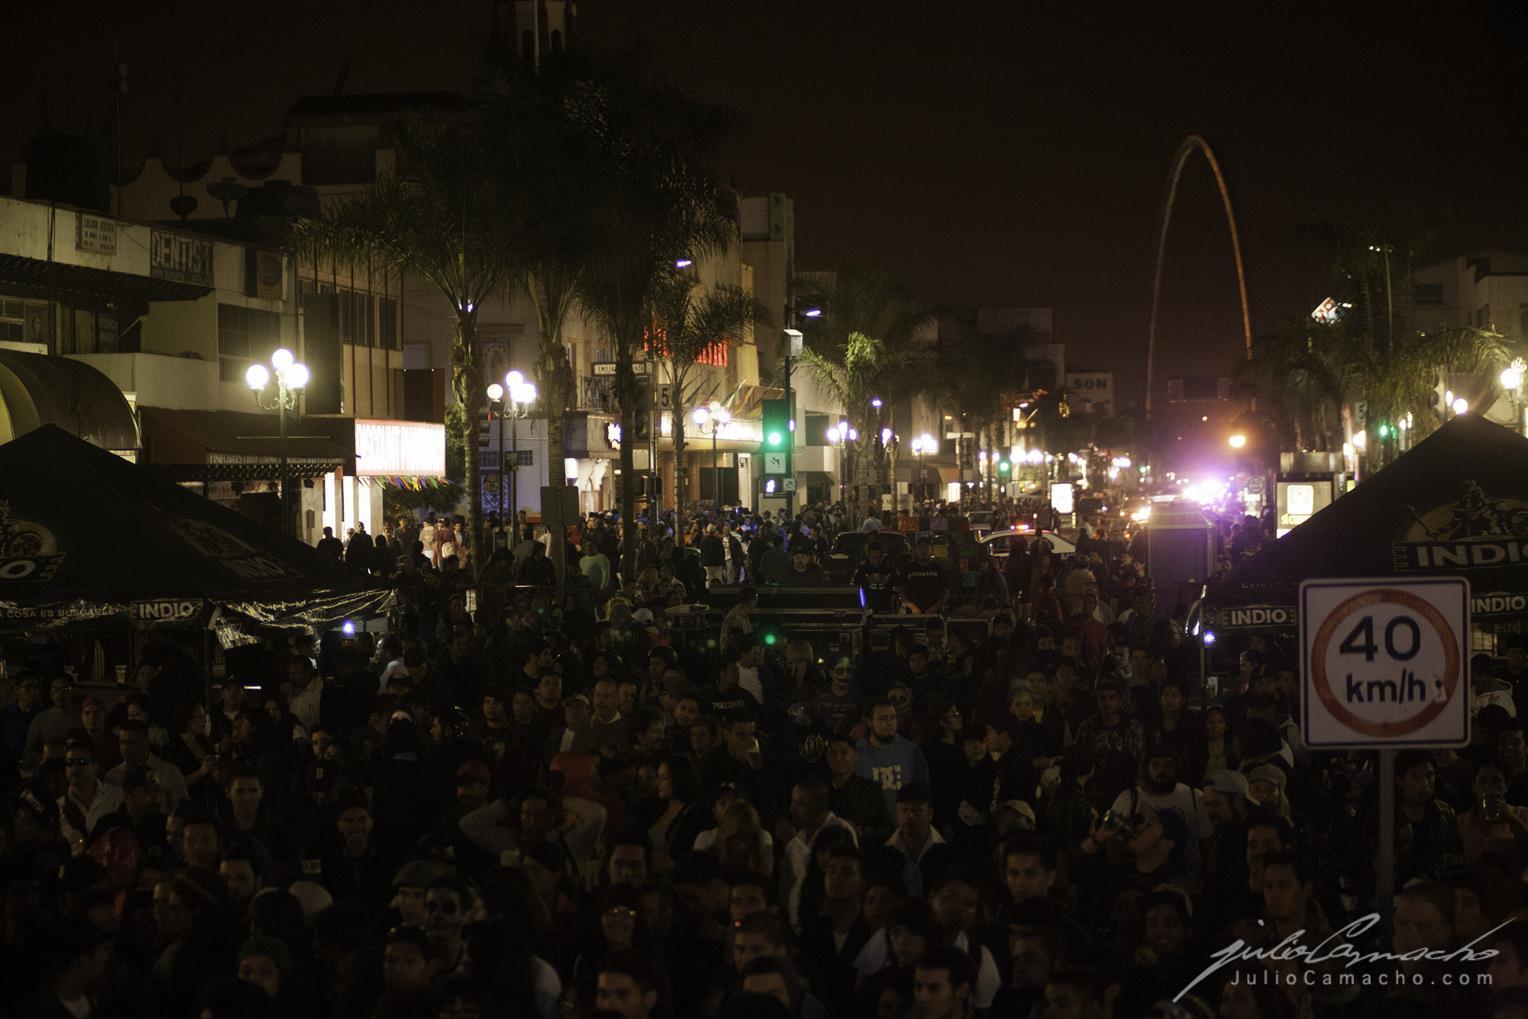 2014-10-30 31 CAST TOUR Ensenada y Tijuana - 1351 - www.Juli (Copy).jpg